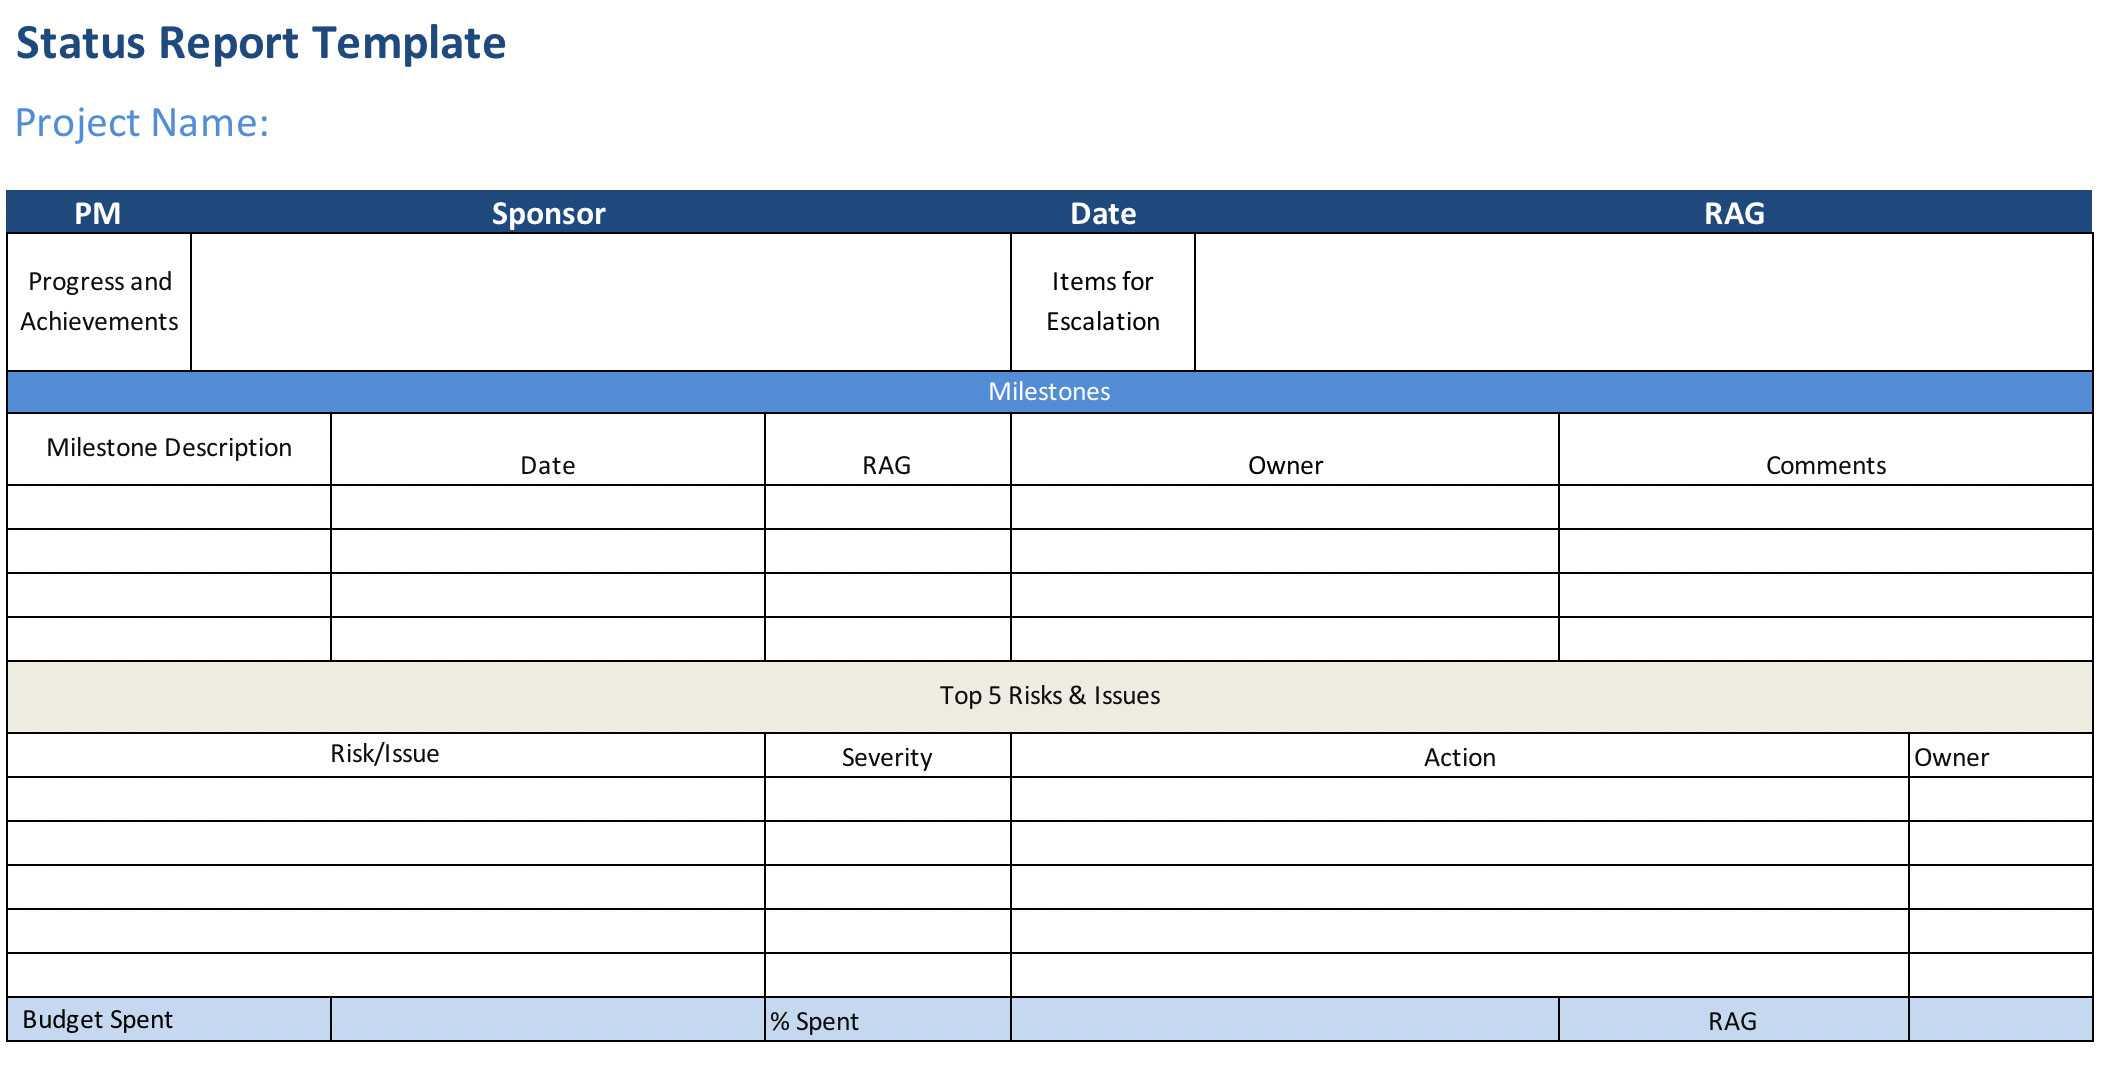 Project Status Report (Free Excel Template) - Projectmanager Regarding Development Status Report Template